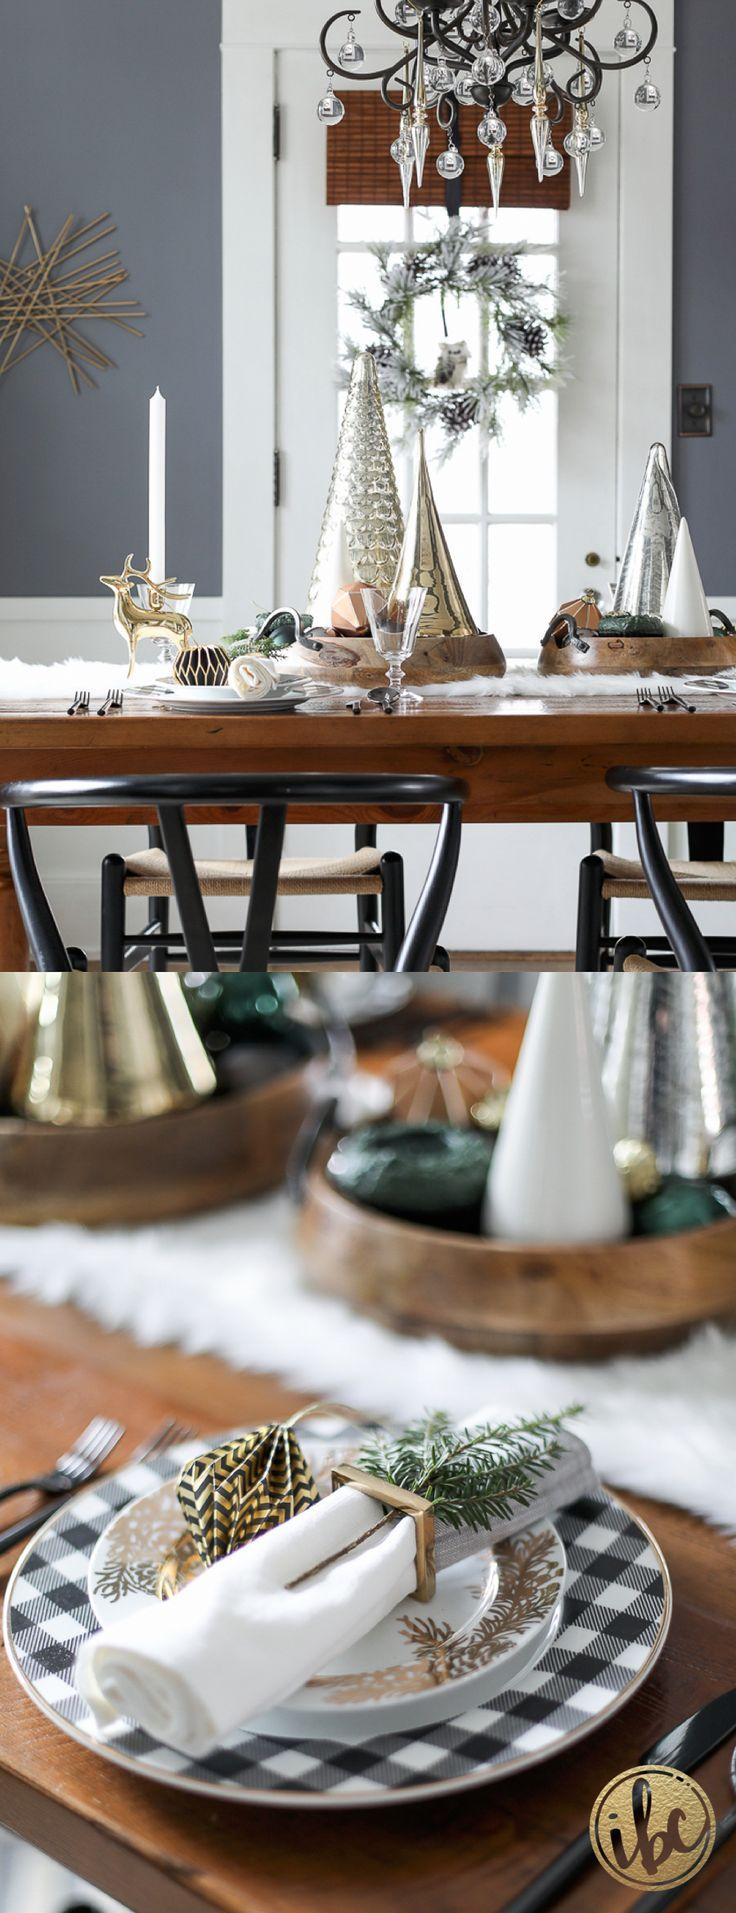 Black, Metallic, and Green Dining Room Christmas Decor | Holiday Home Tour via inspiredbycharm.com